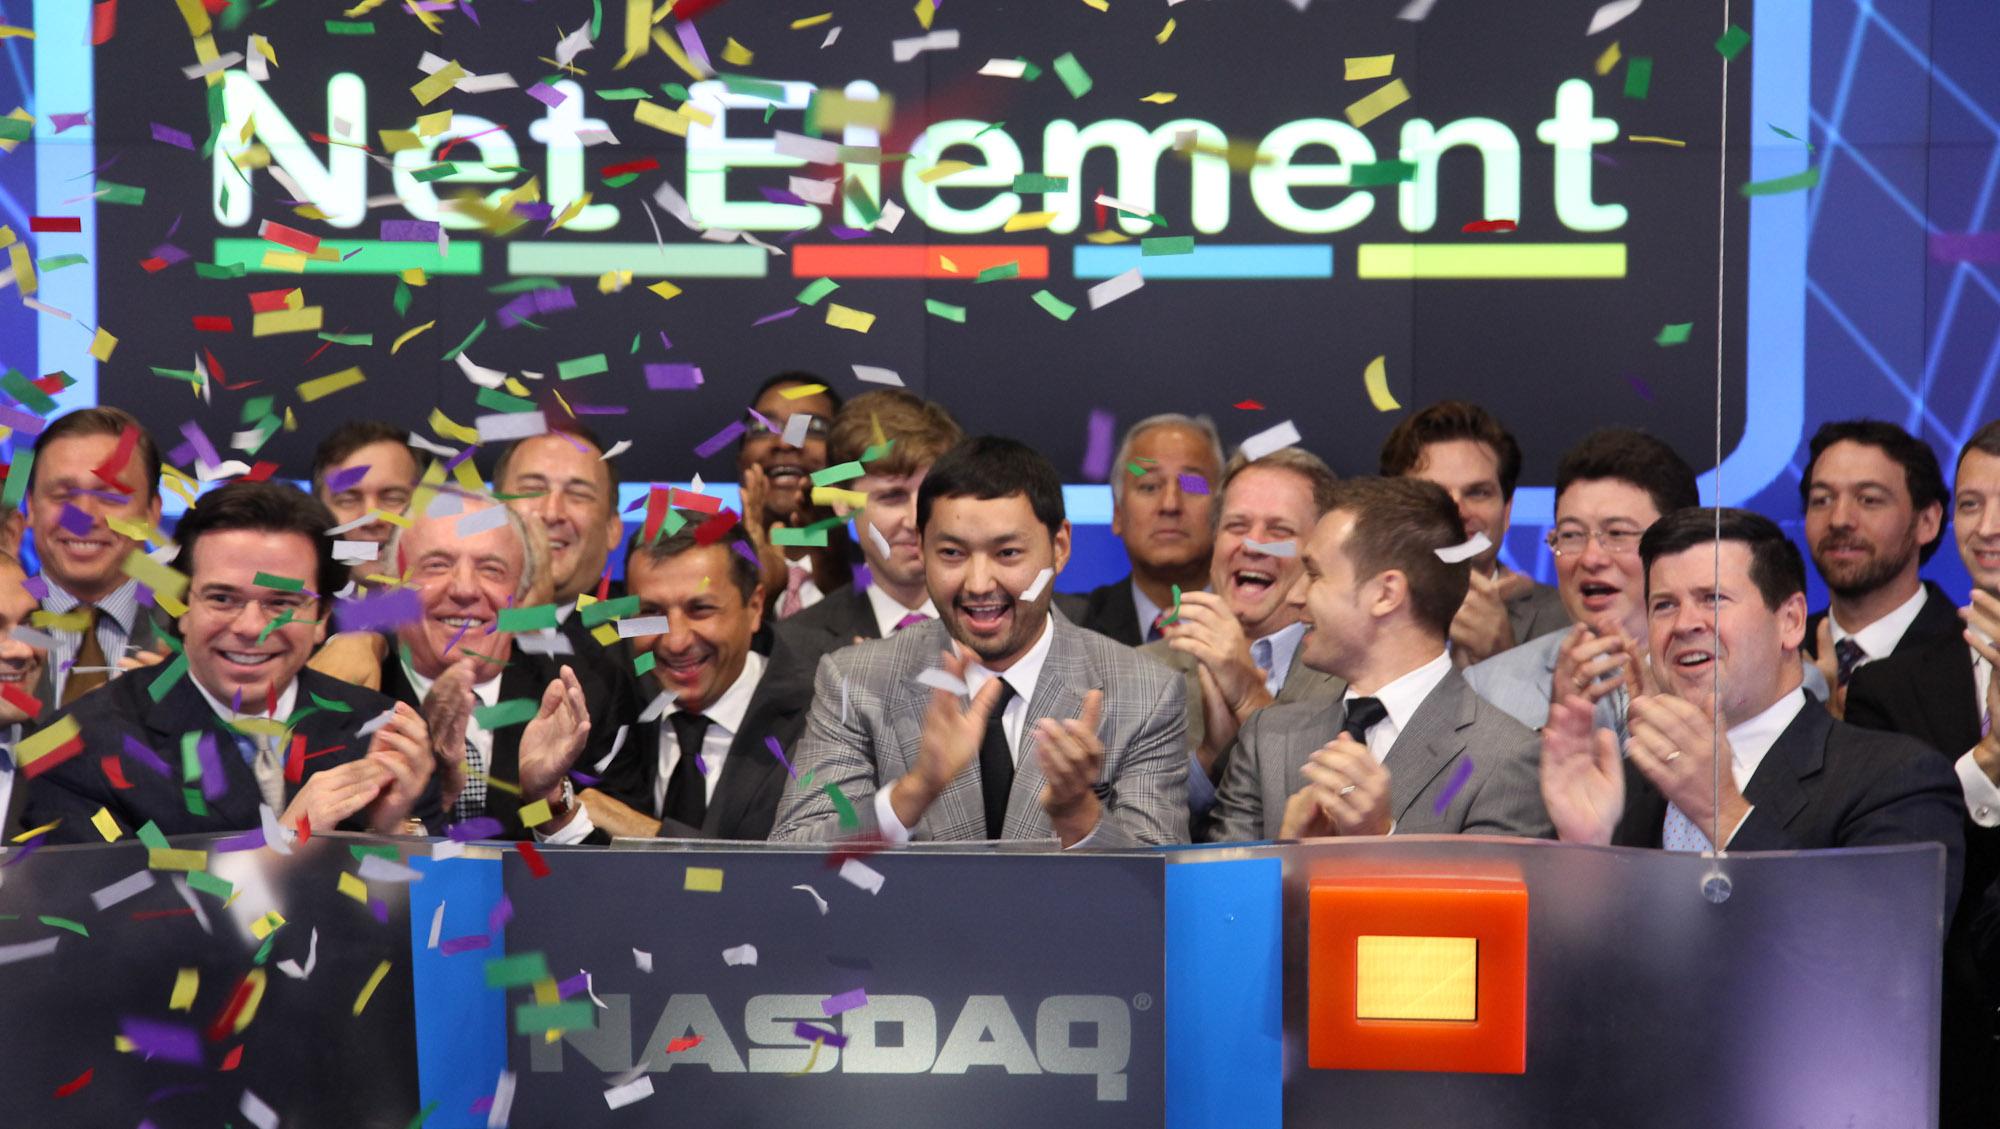 Запуск торговли акциями Net Element Кенеса Ракишева на Nasdaq